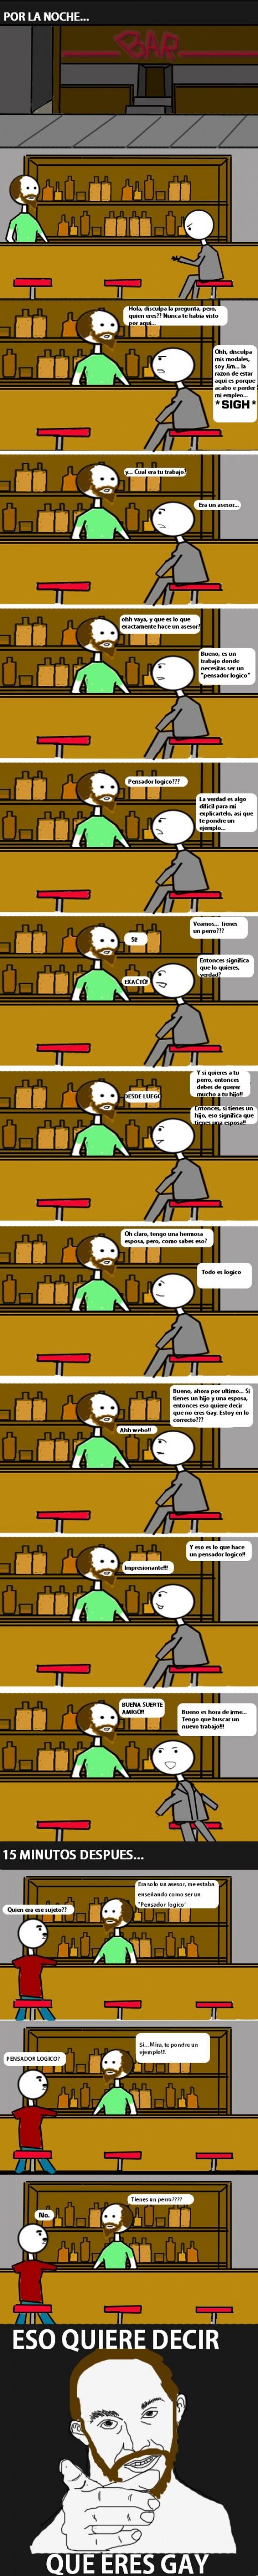 asesor,bar,logico,pensador